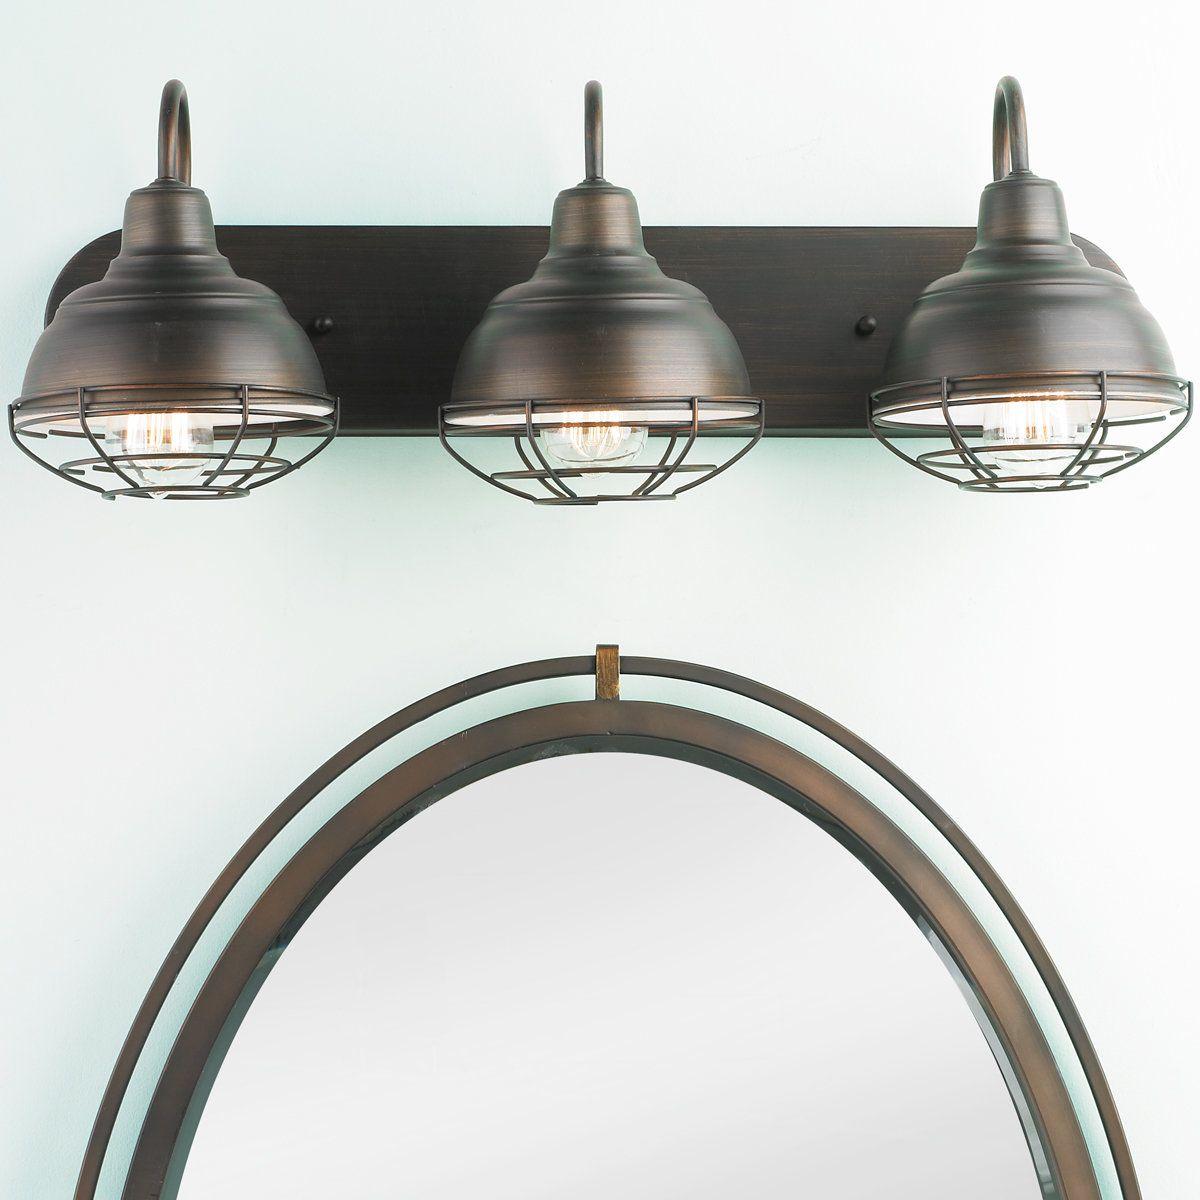 kqvu il light vanity wood barn industrial fixture pipe listing bathroom bar fullxfull